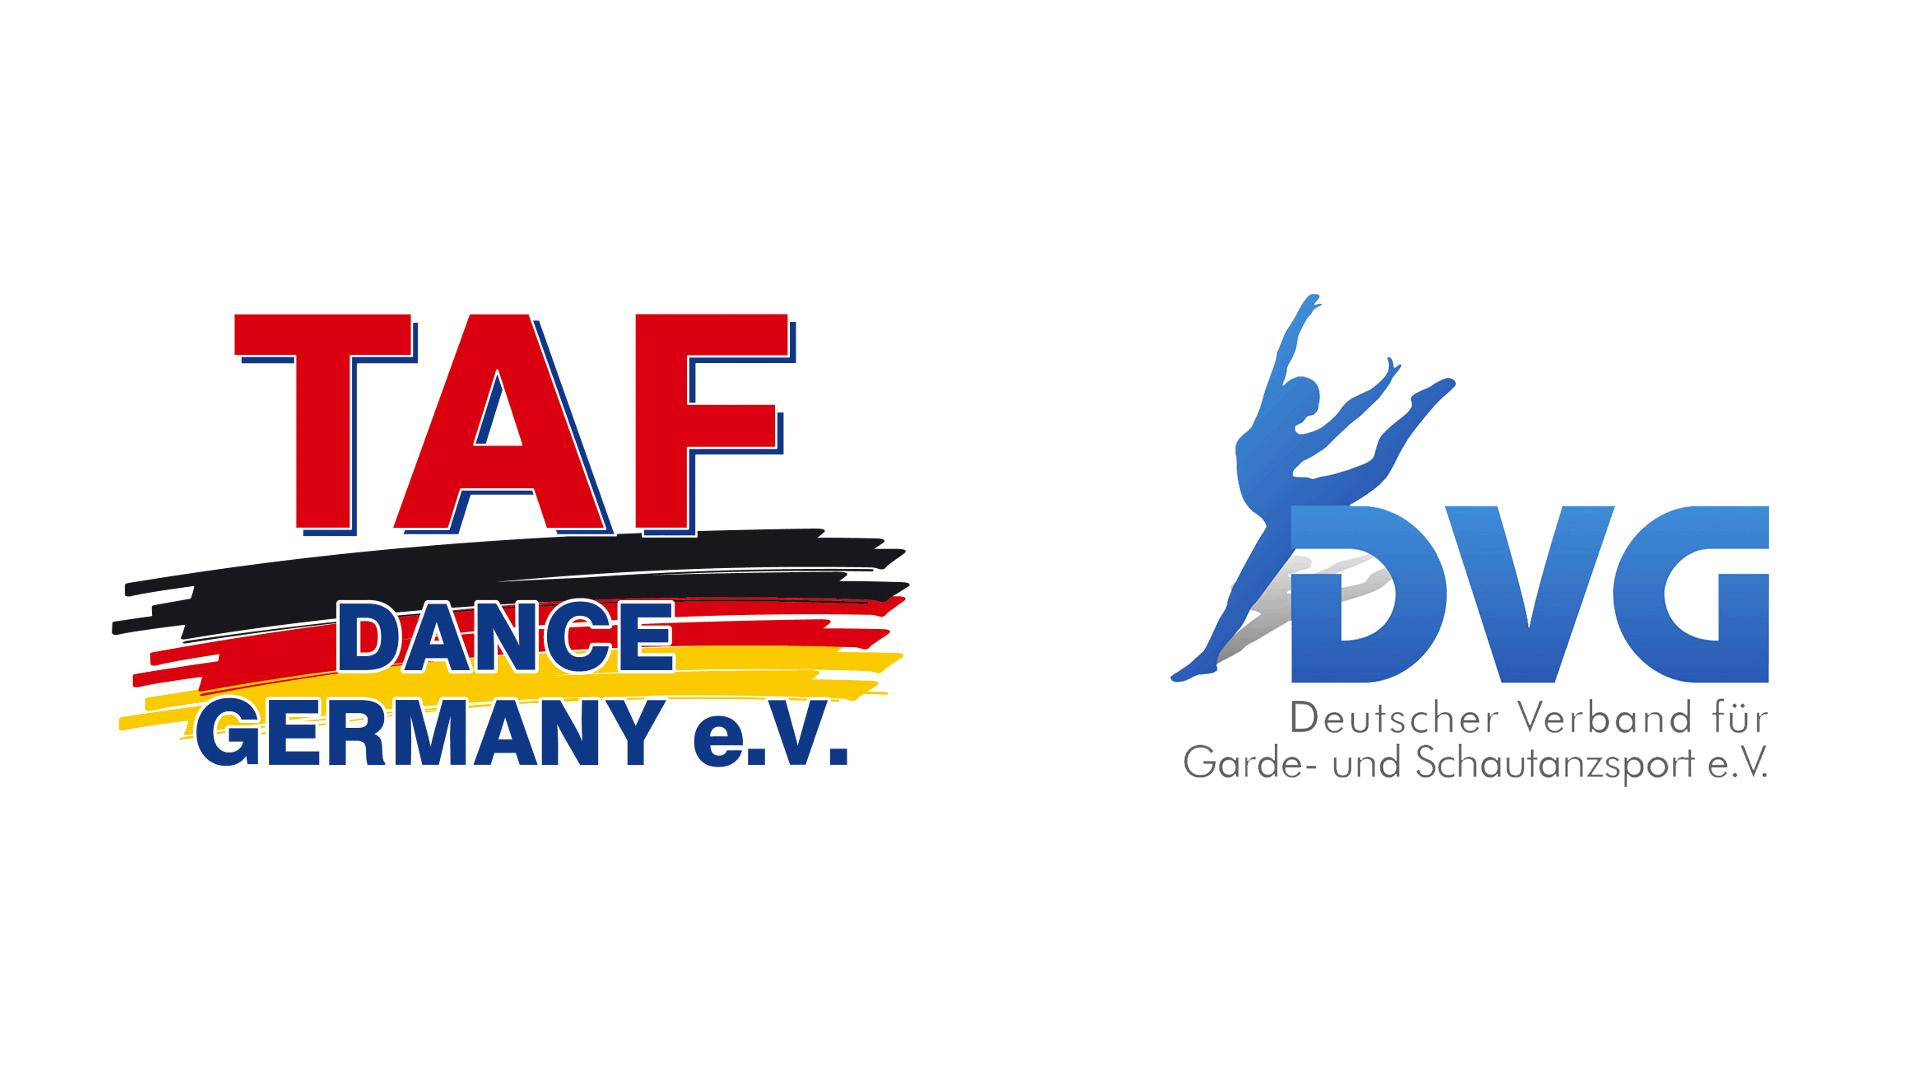 TAF Dance Germany e.V. und DVG e.V.